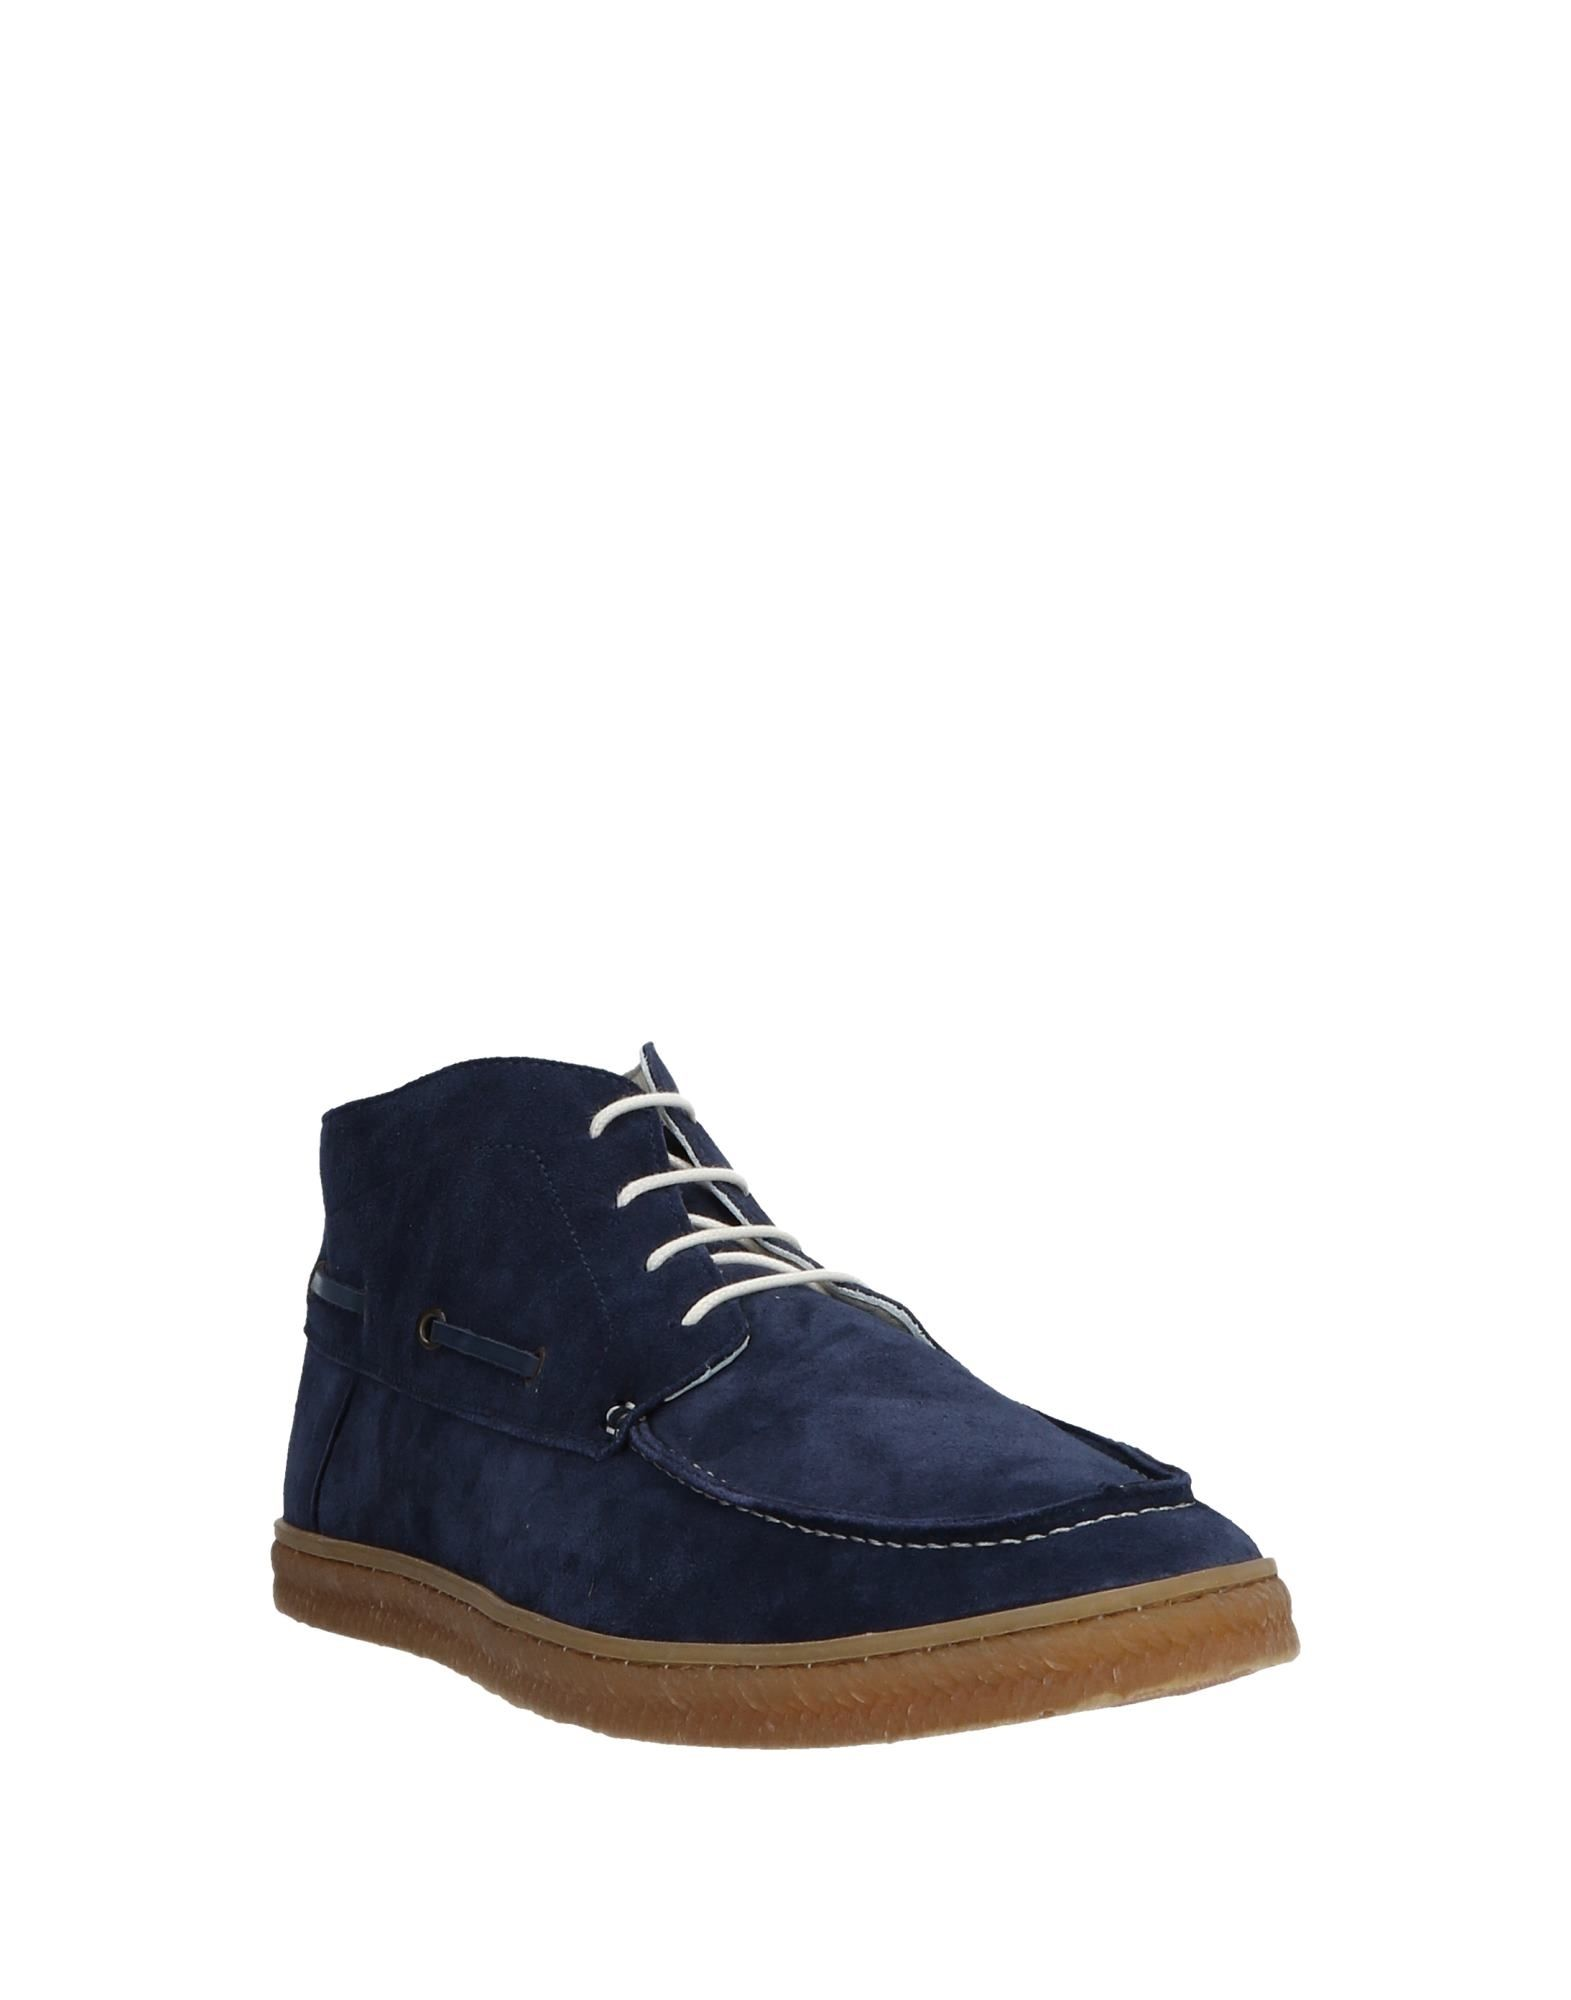 Rabatt Herren echte Schuhe Francesconi Stiefelette Herren Rabatt  11523331HH 79c45e